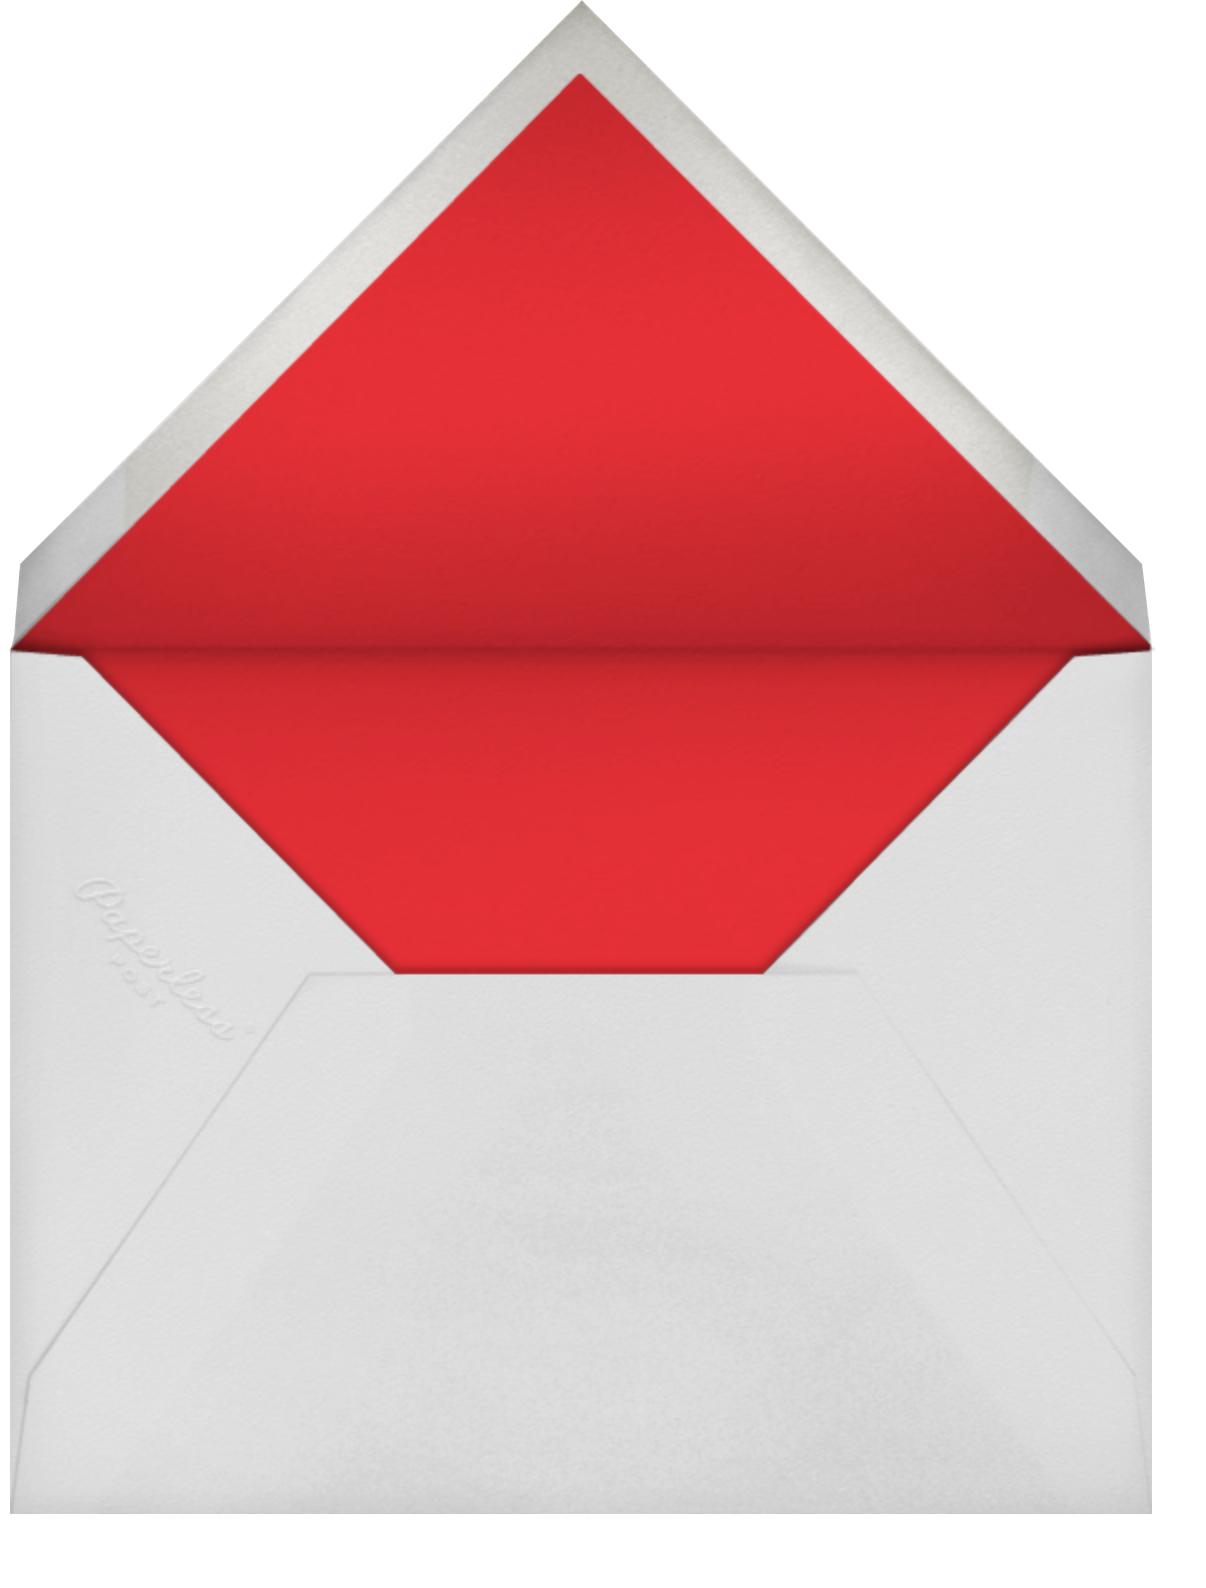 Ellis Hall II (Tall) - Gold - kate spade new york - kate spade new york - envelope back